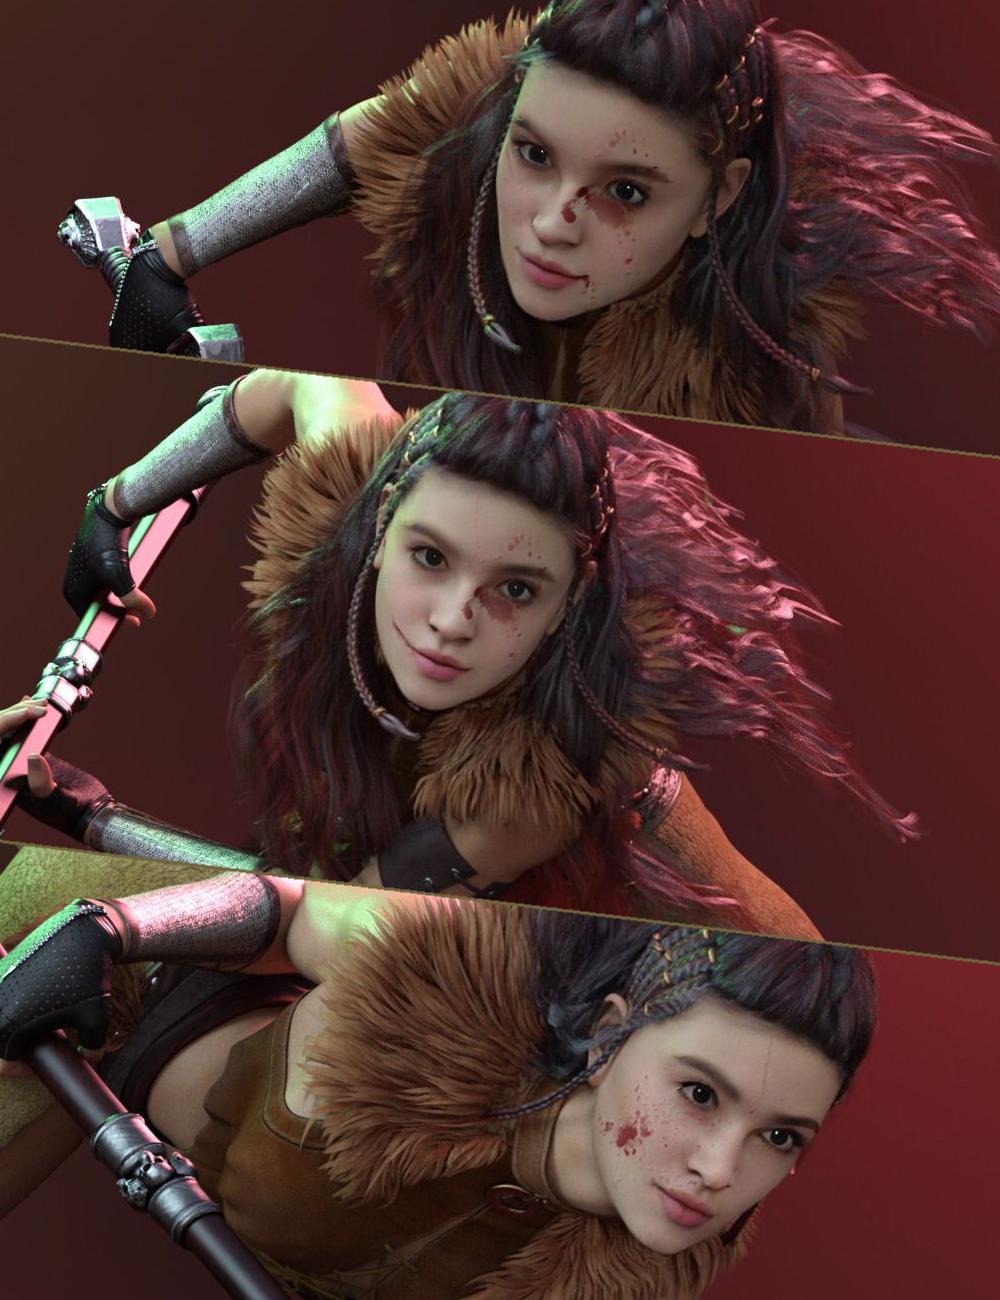 GF TOTAL Fantasy Warrior Poses for Genesis 8 Females by: Nirvana, 3D Models by Daz 3D